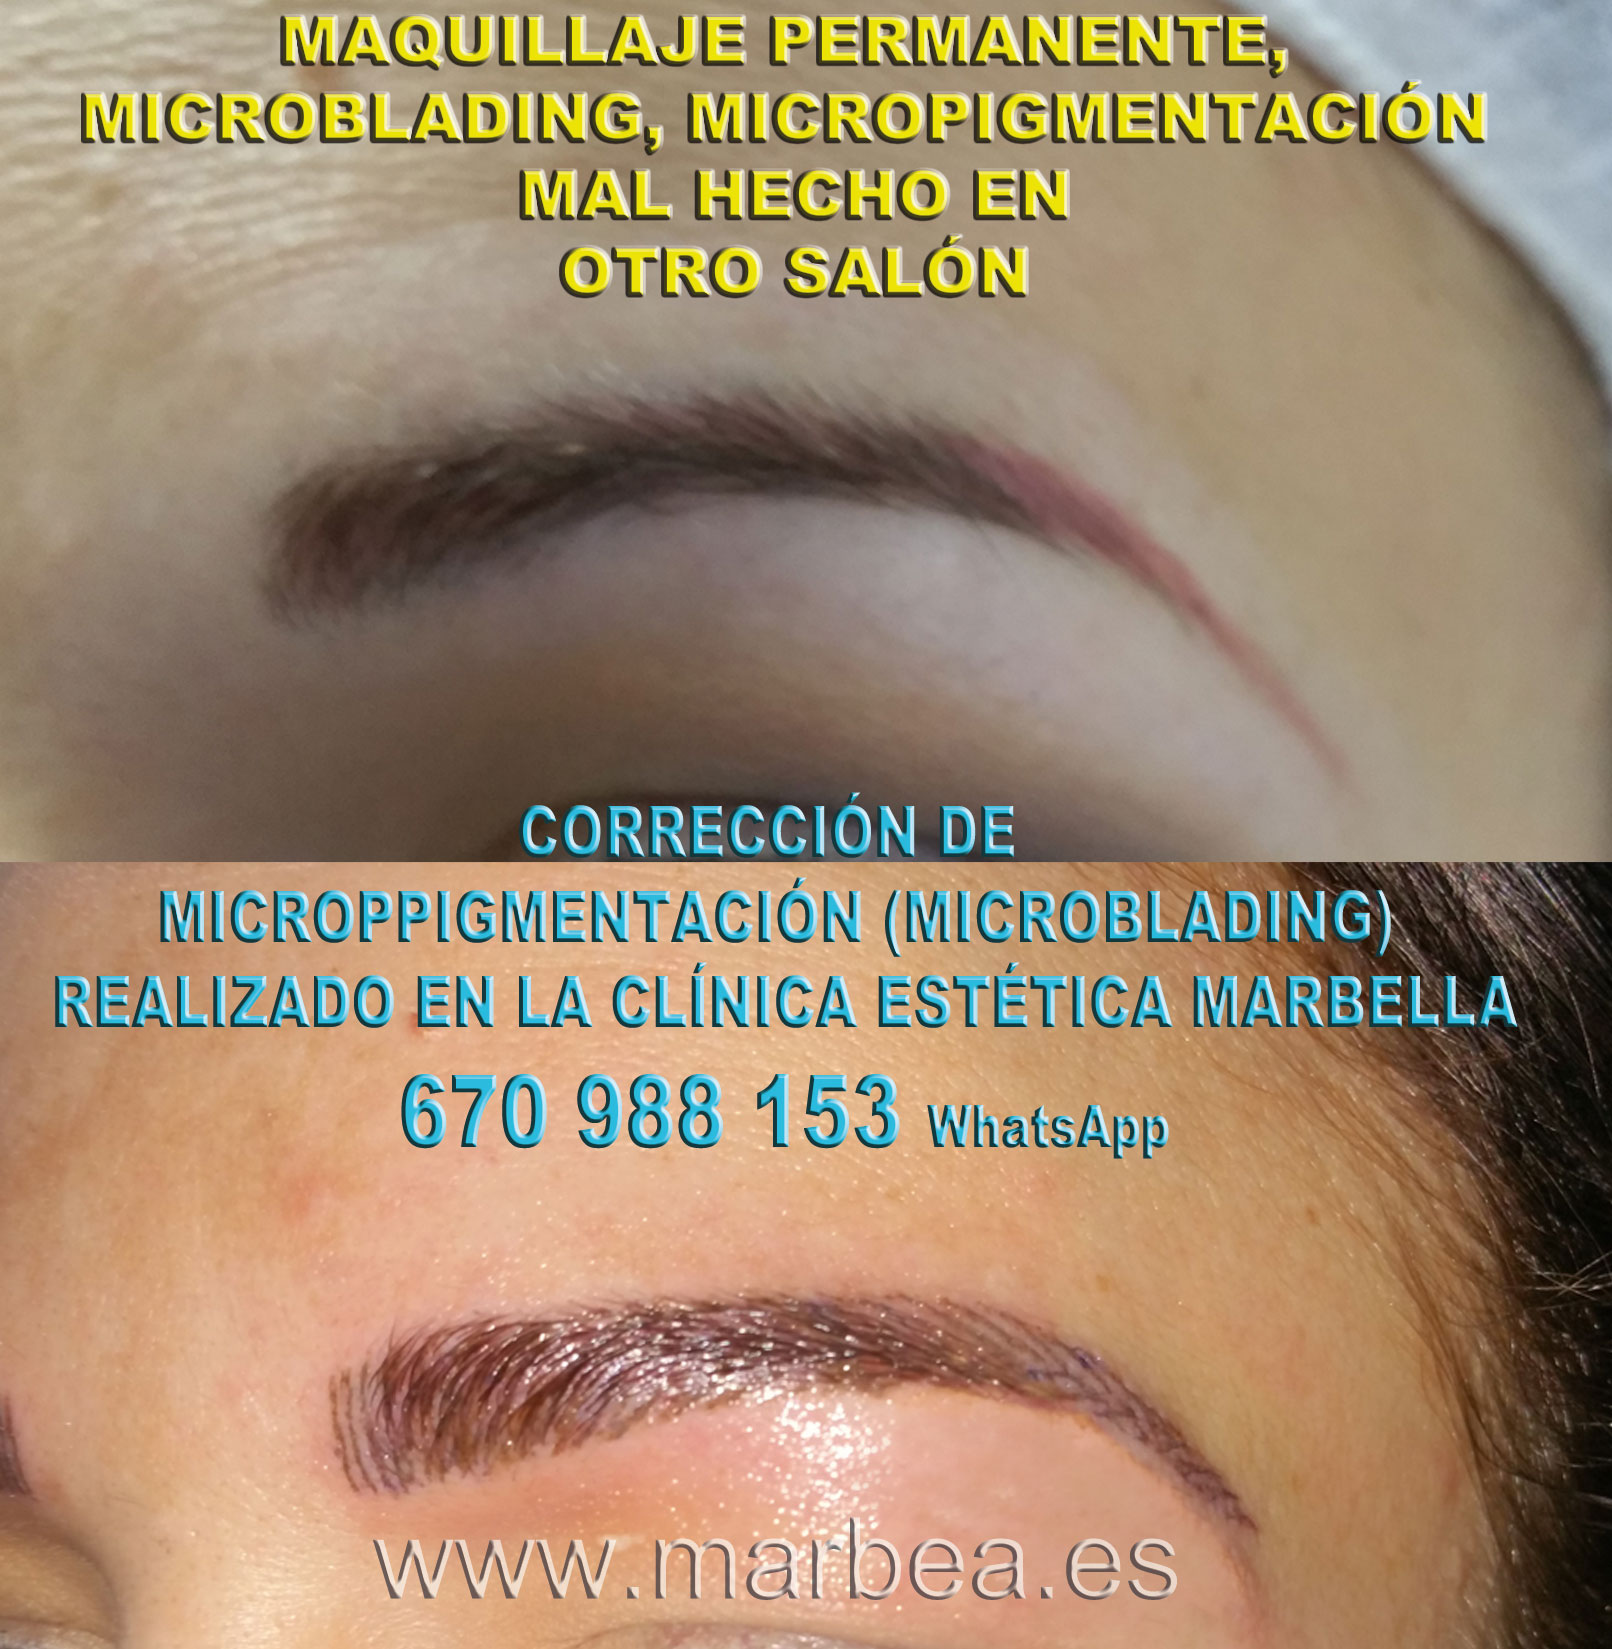 ELIMINAR TATUAJE CEJAS clínica estética maquillaje semipermanente ofrenda eliminar la micropigmentación de cejas,corregir micropigmentación no deseada